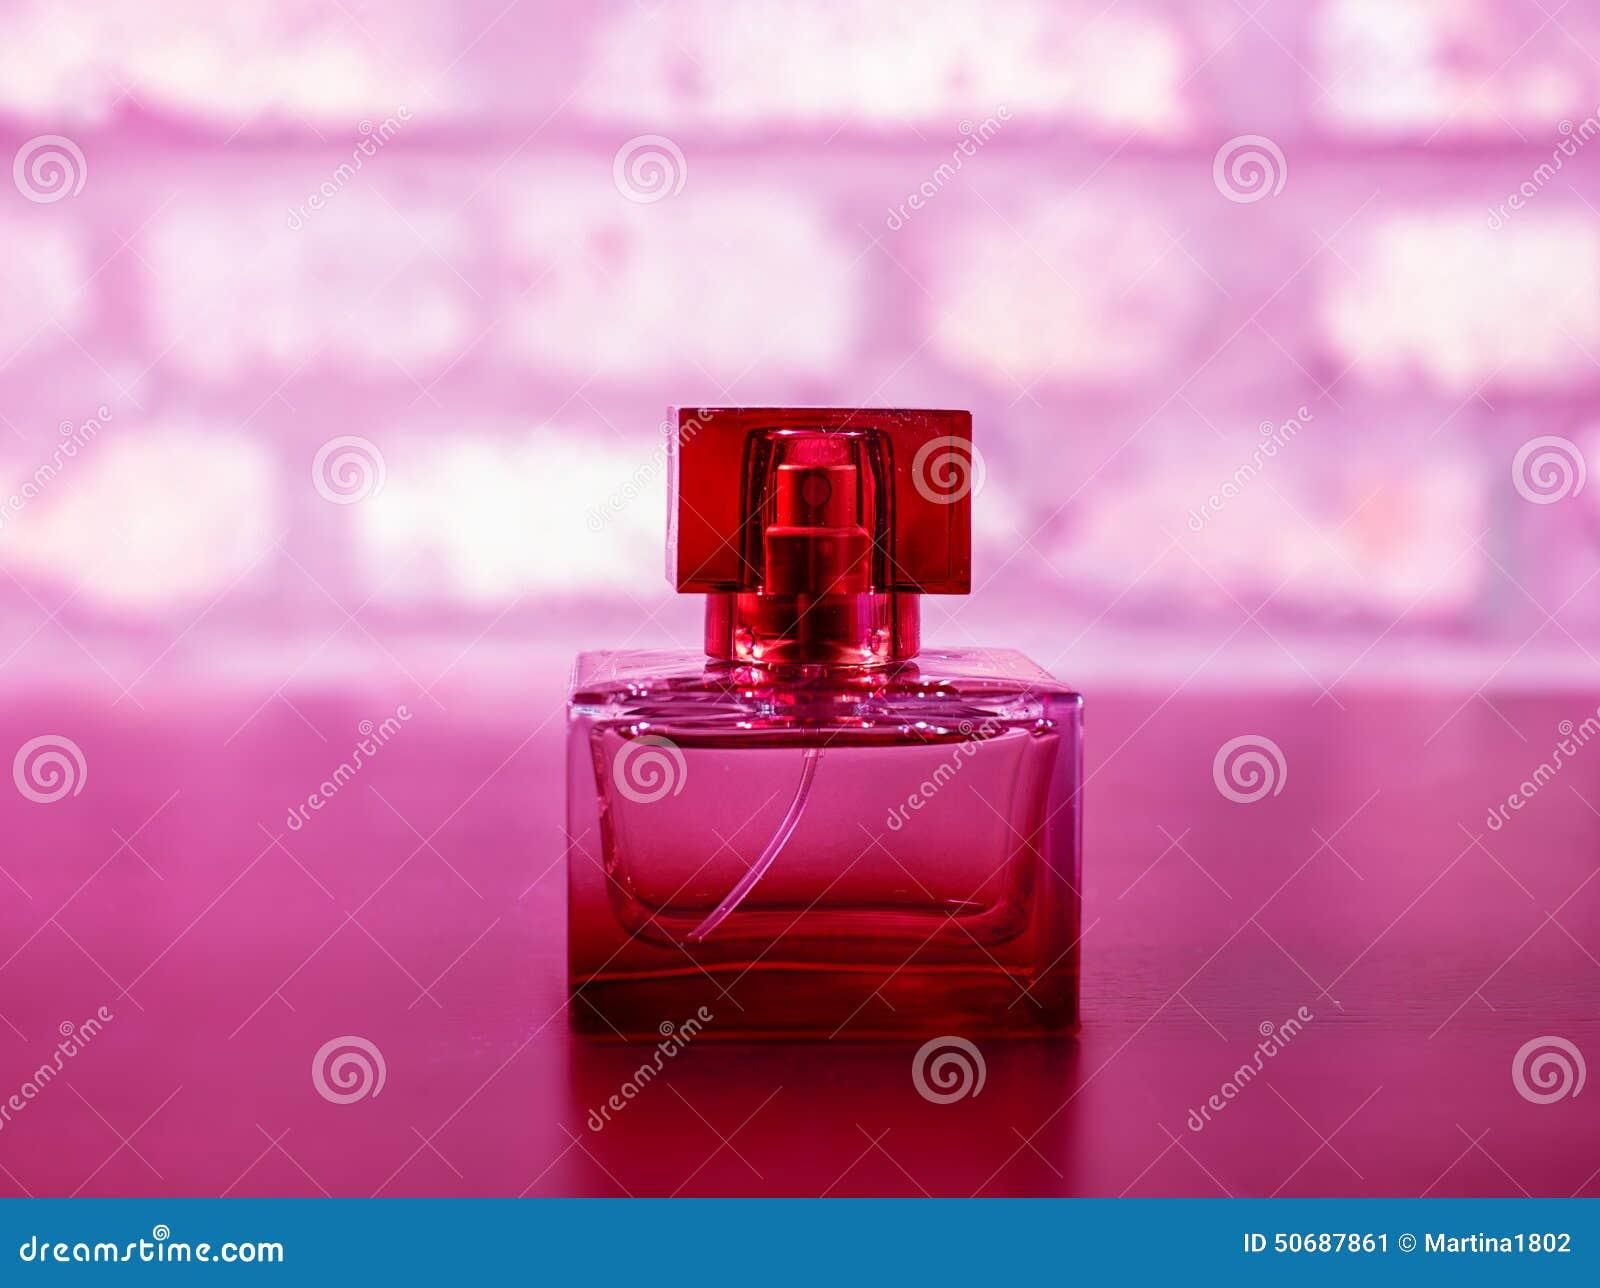 Download 在红颜色的Parfume 库存图片. 图片 包括有 礼品, 宏指令, 化妆用品, 玻璃, 芬芳, 淫荡, 气味 - 50687861